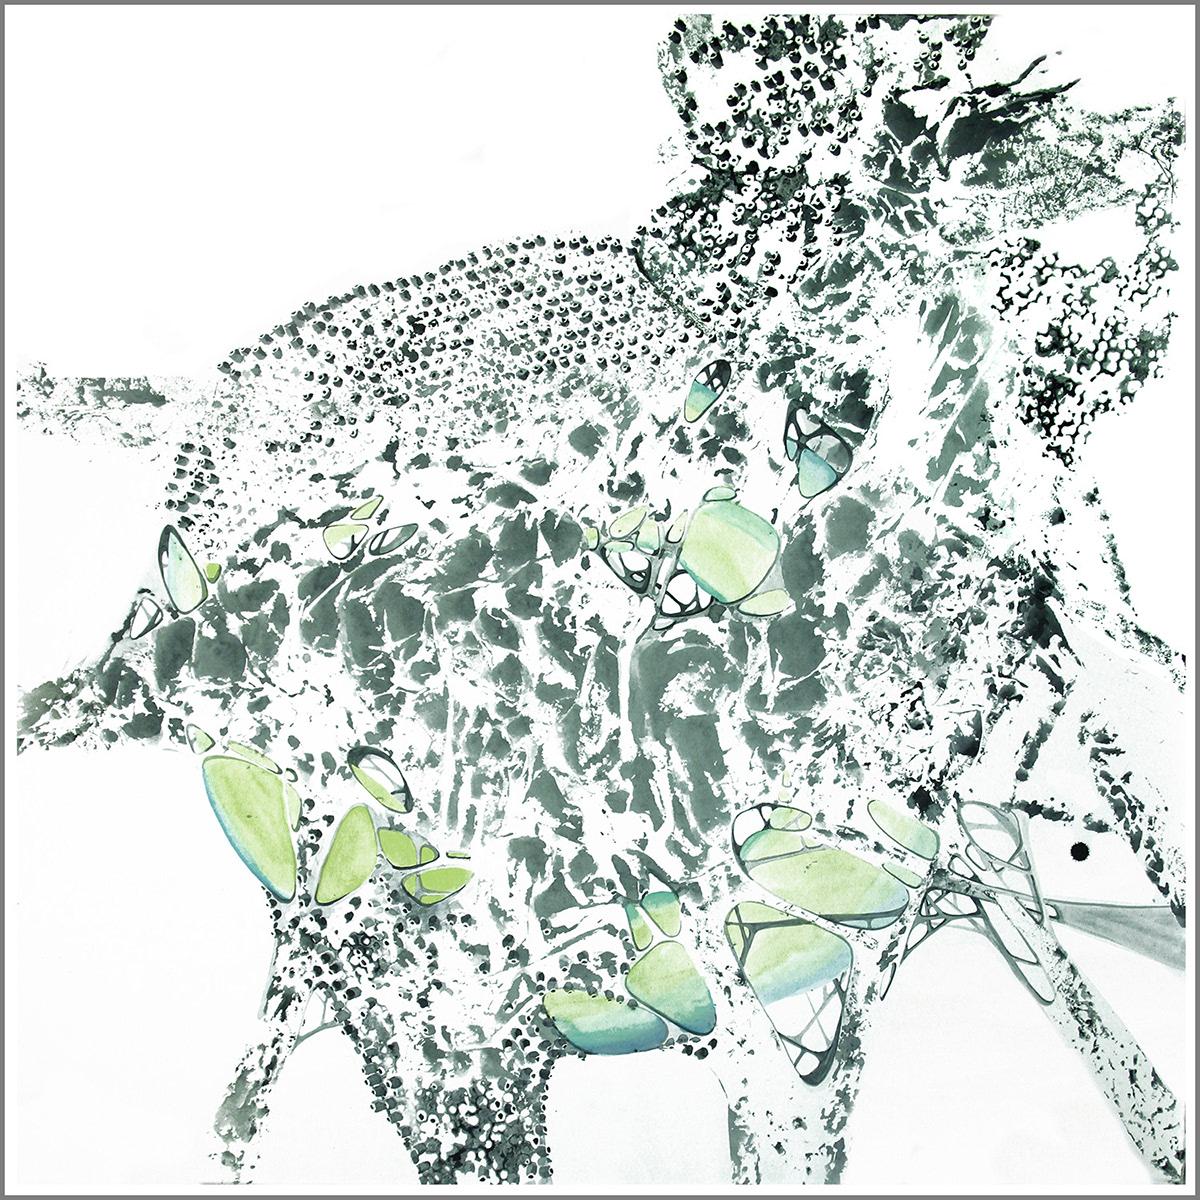 concept art creative watercolor графика дизайн картина концепт креатив рисунок Сад камней